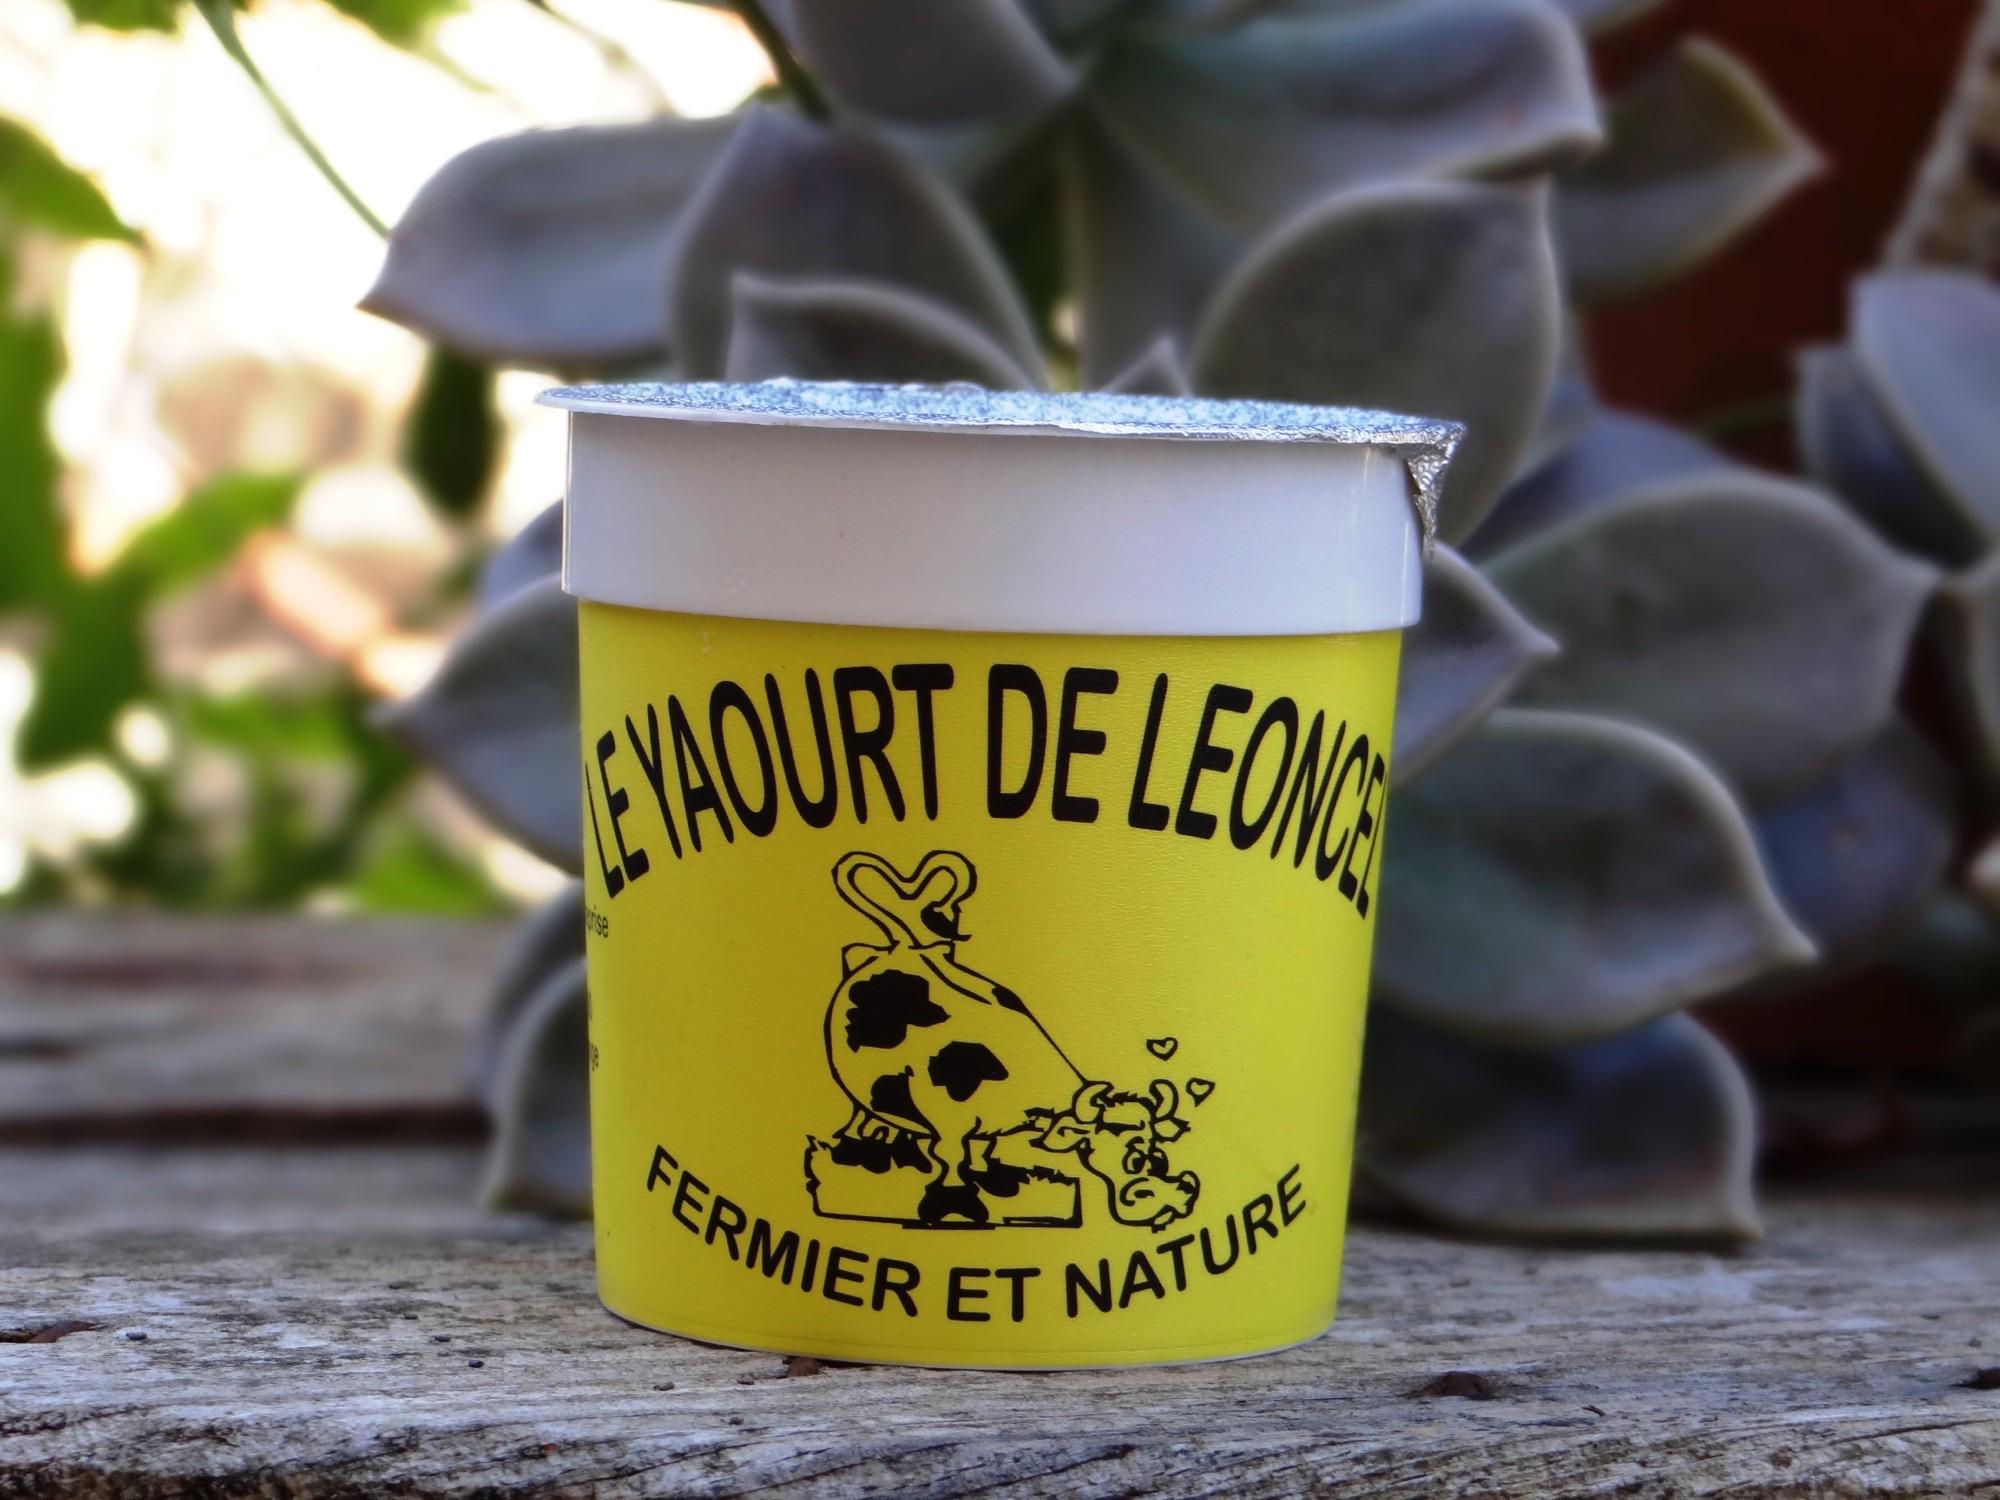 http://www.guillaud-traiteur.com/wp-content/uploads/2012/07/LEONCEL-YAOURT.jpeg